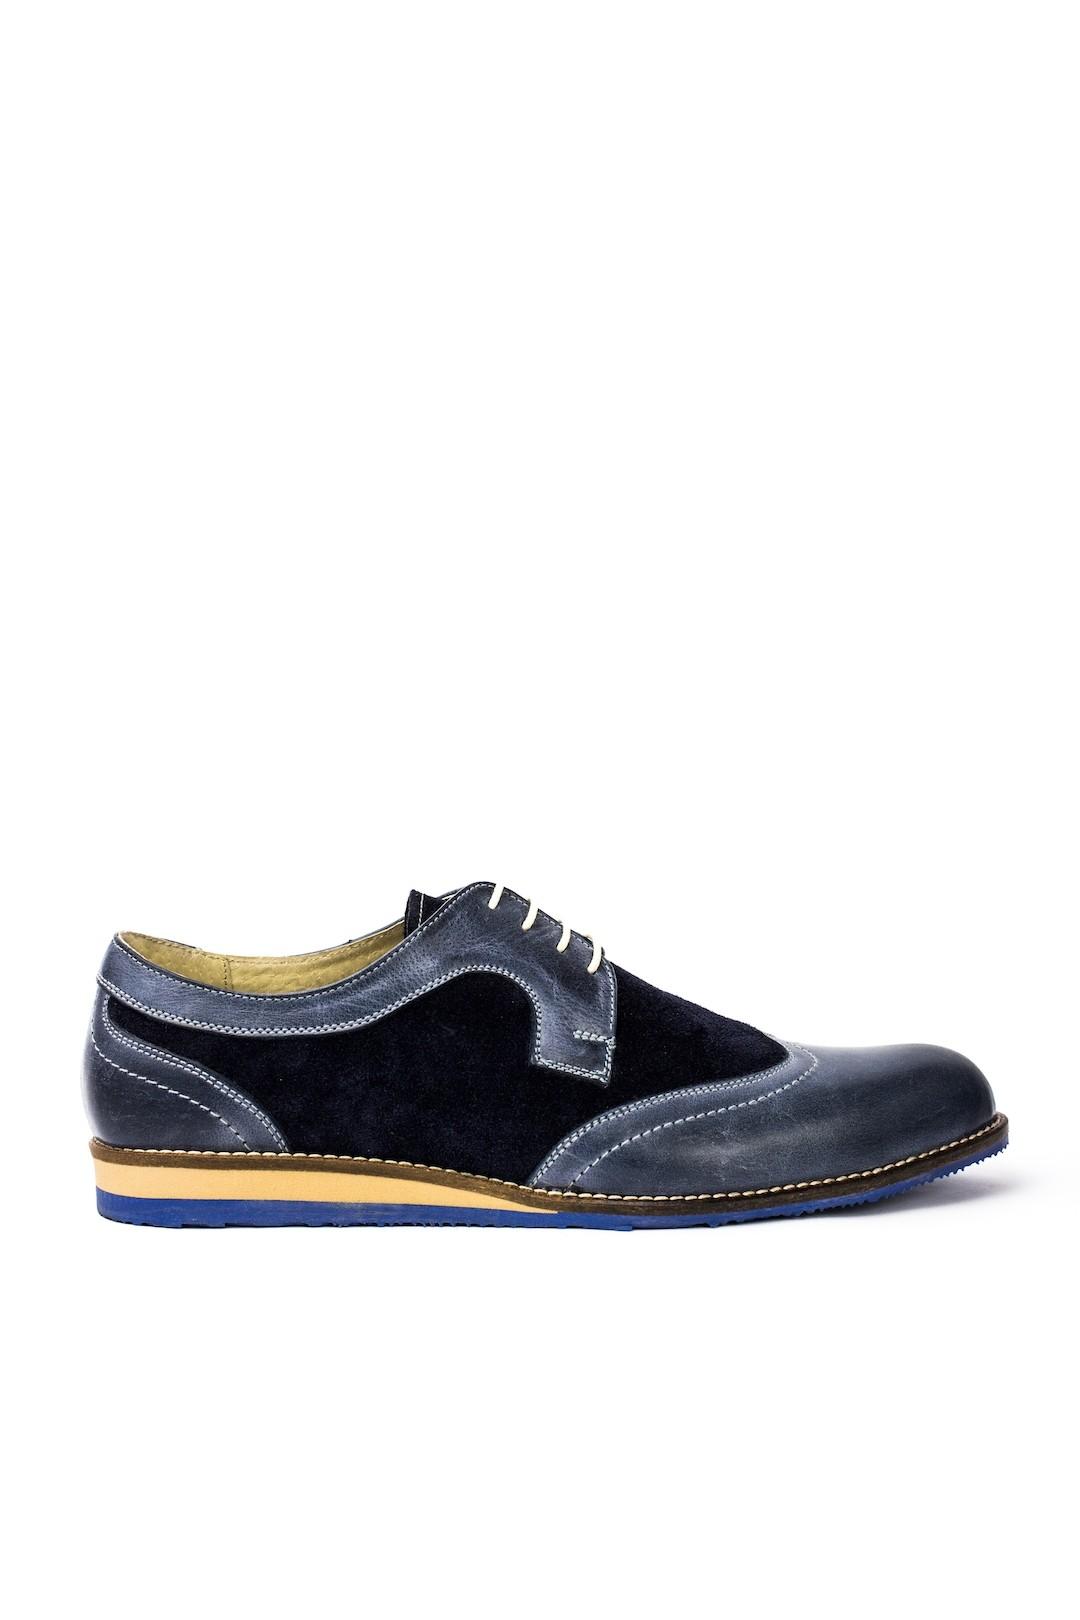 Pantofi Barbati piele naturala albastru Paul